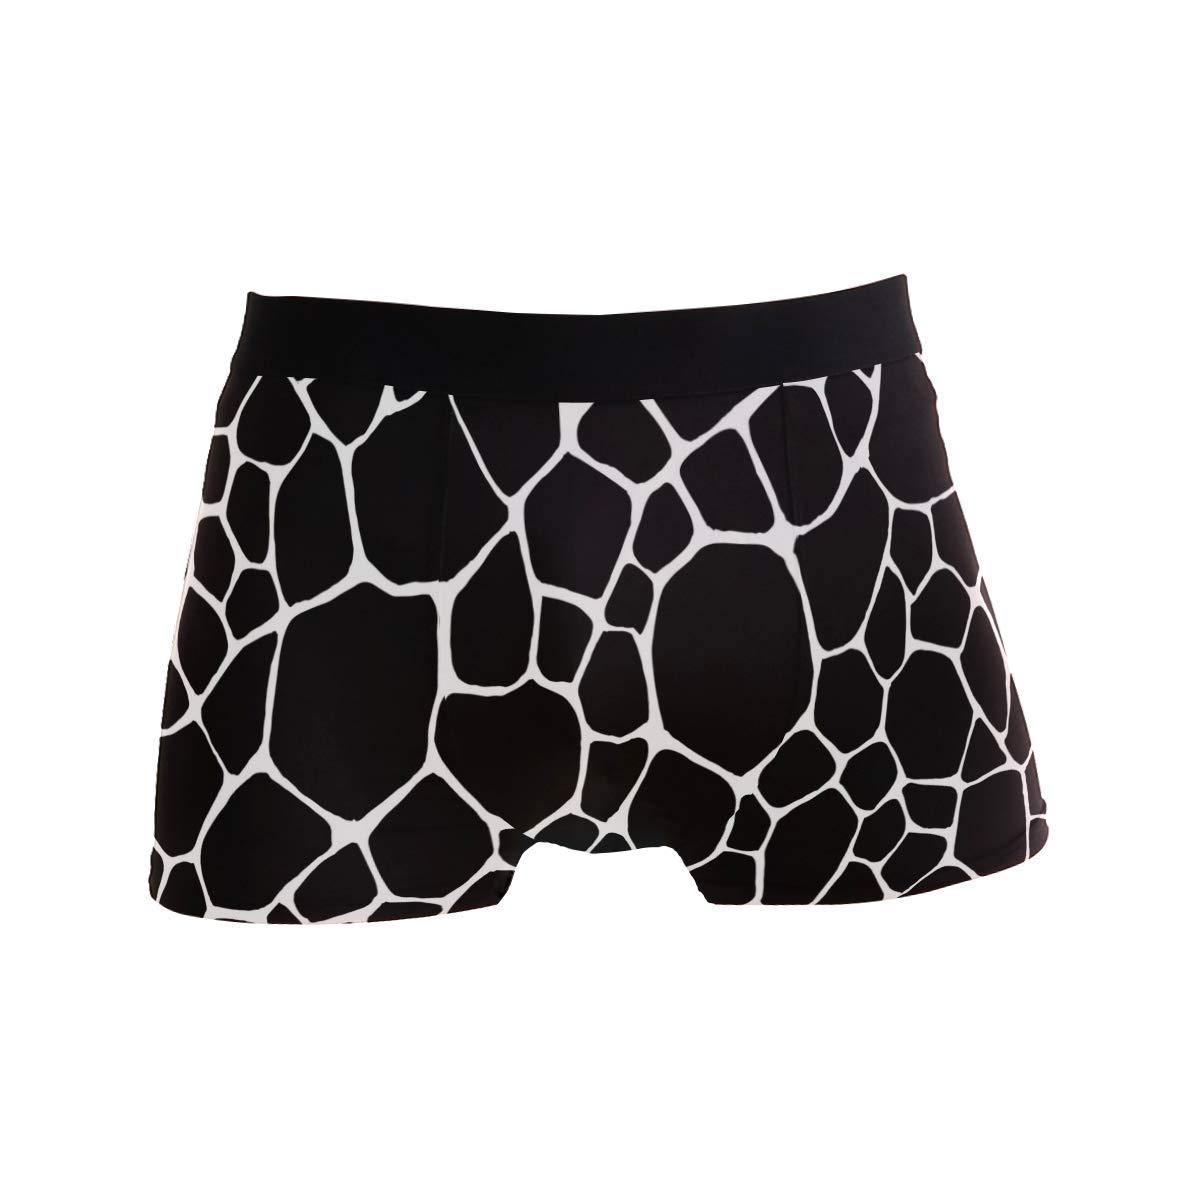 BETTKEN Mens Boxer Briefs Geometric Animal Giraffe Print Short Underwear Soft Stretch Underpants for Men Boys S-XL